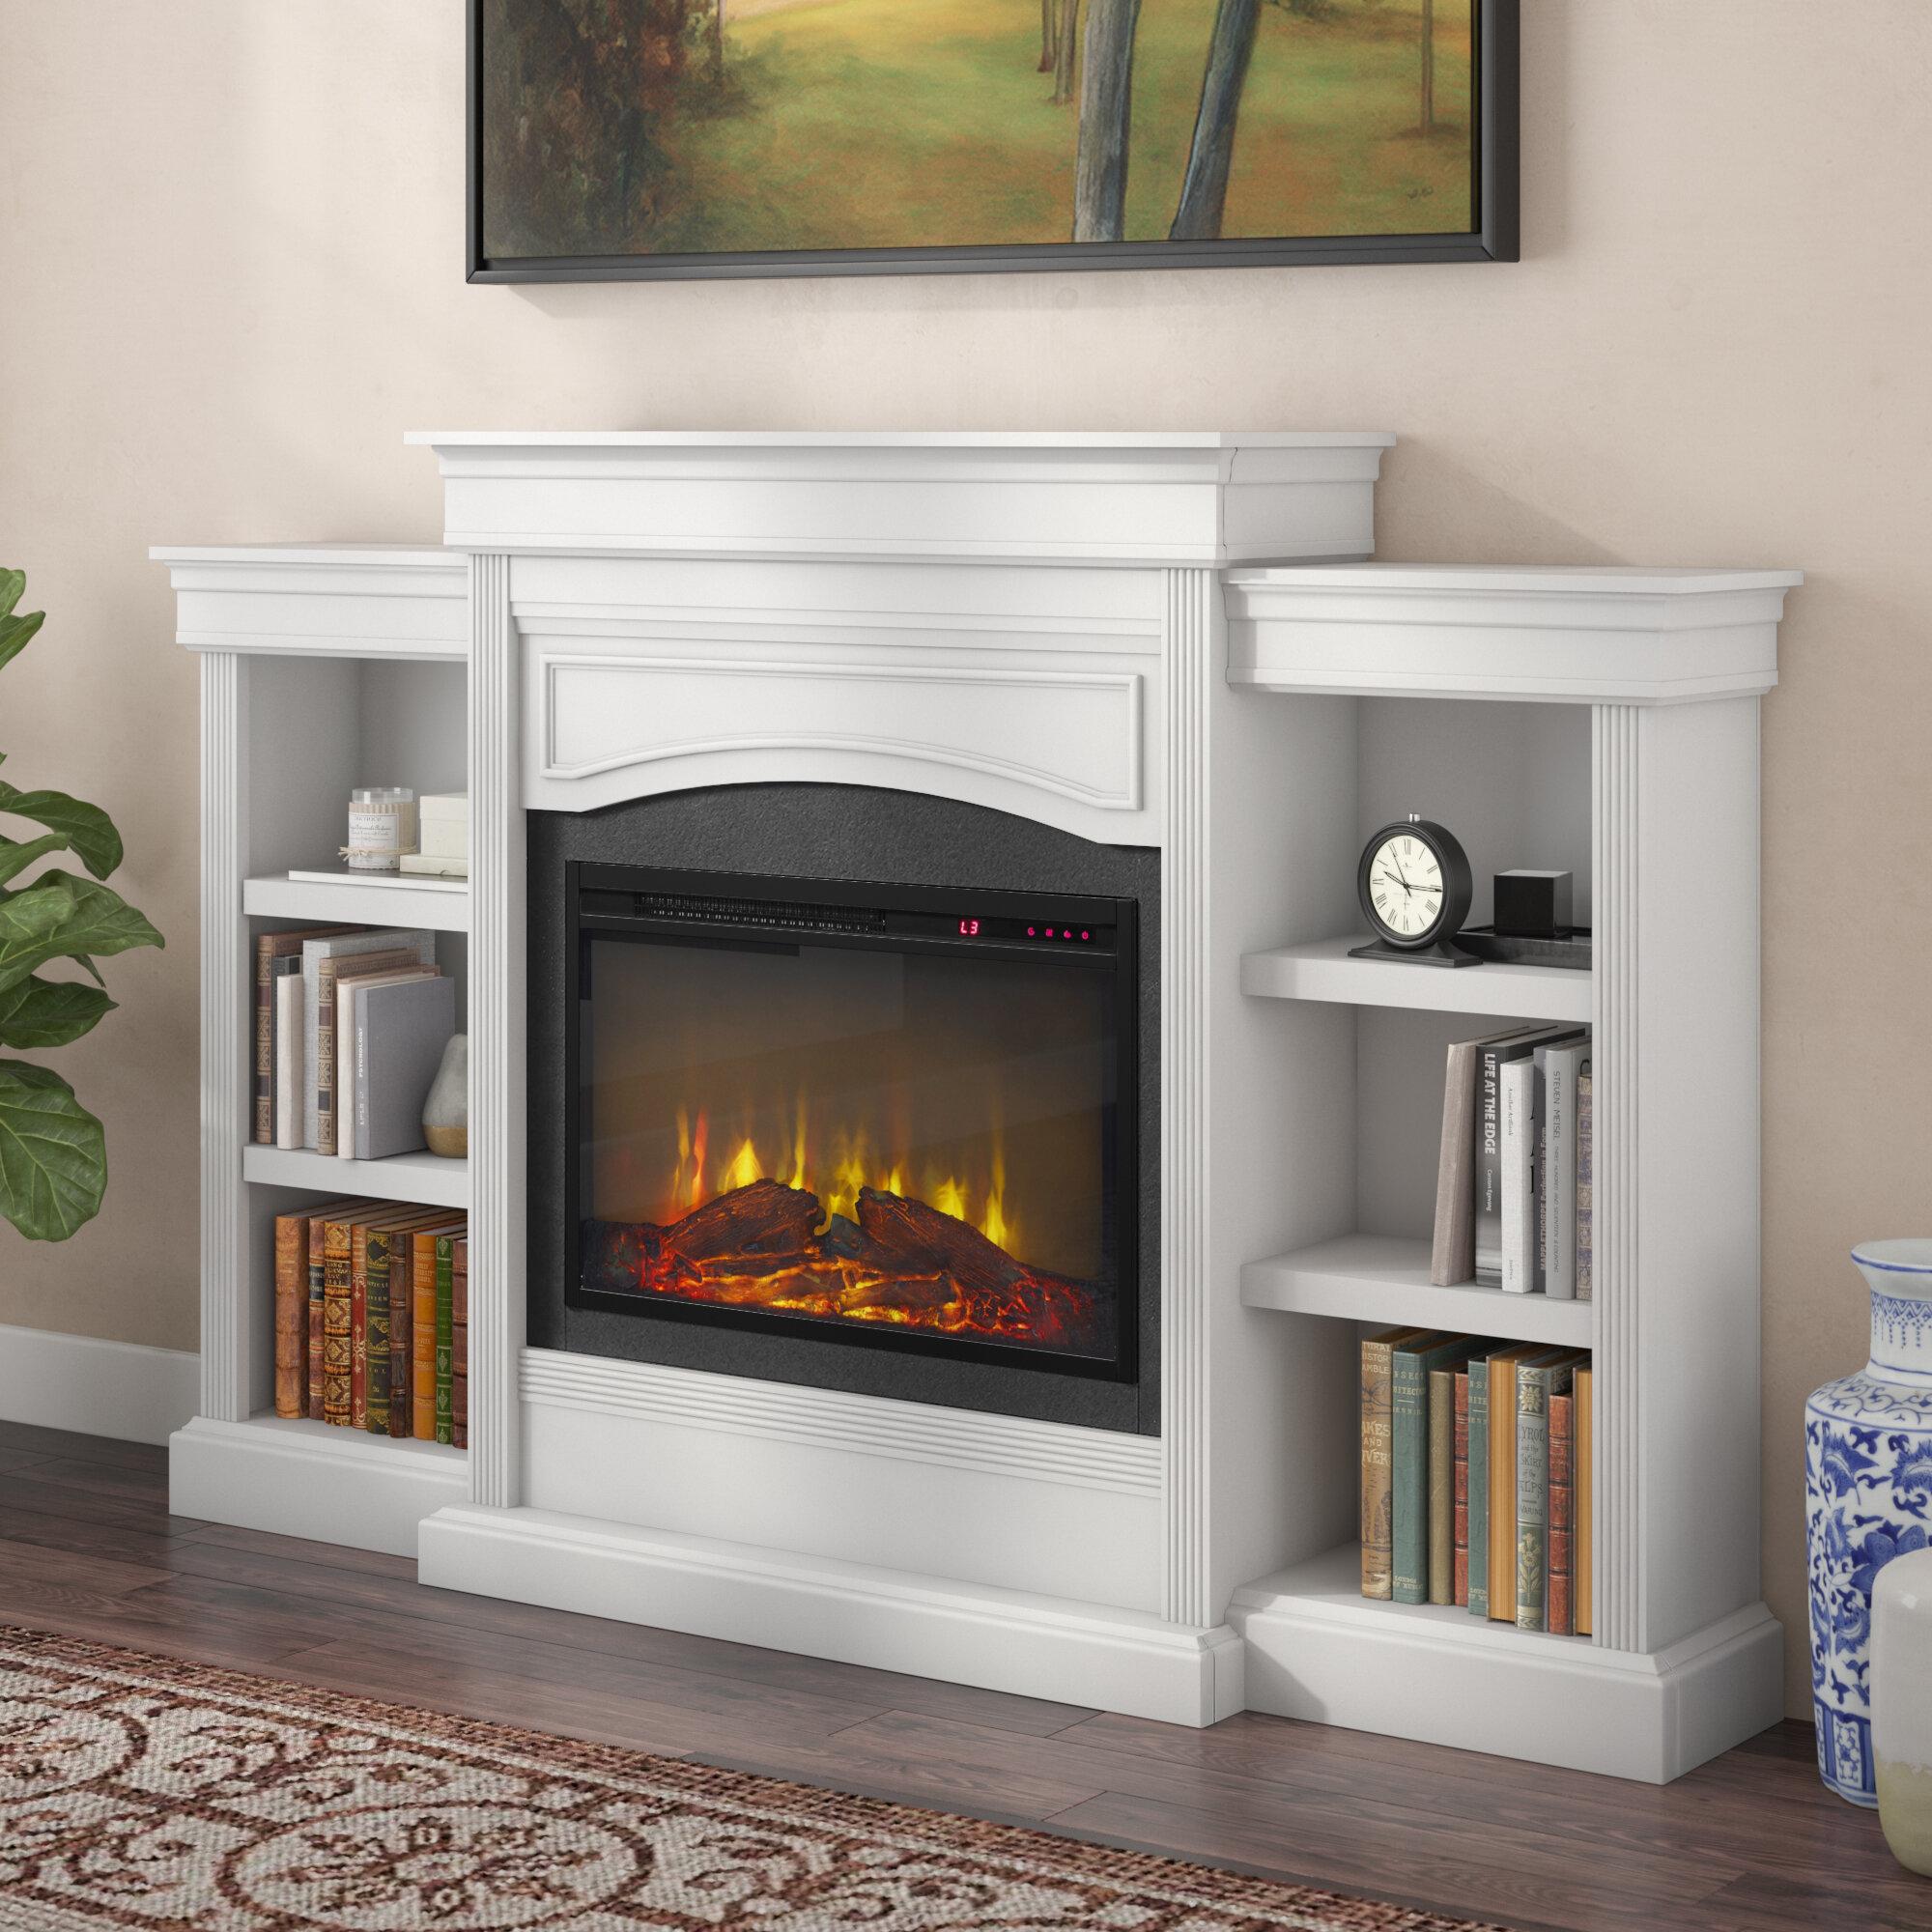 Charlton Home Allsop Mantel Wall Mounted Electric Fireplace Reviews Wayfair